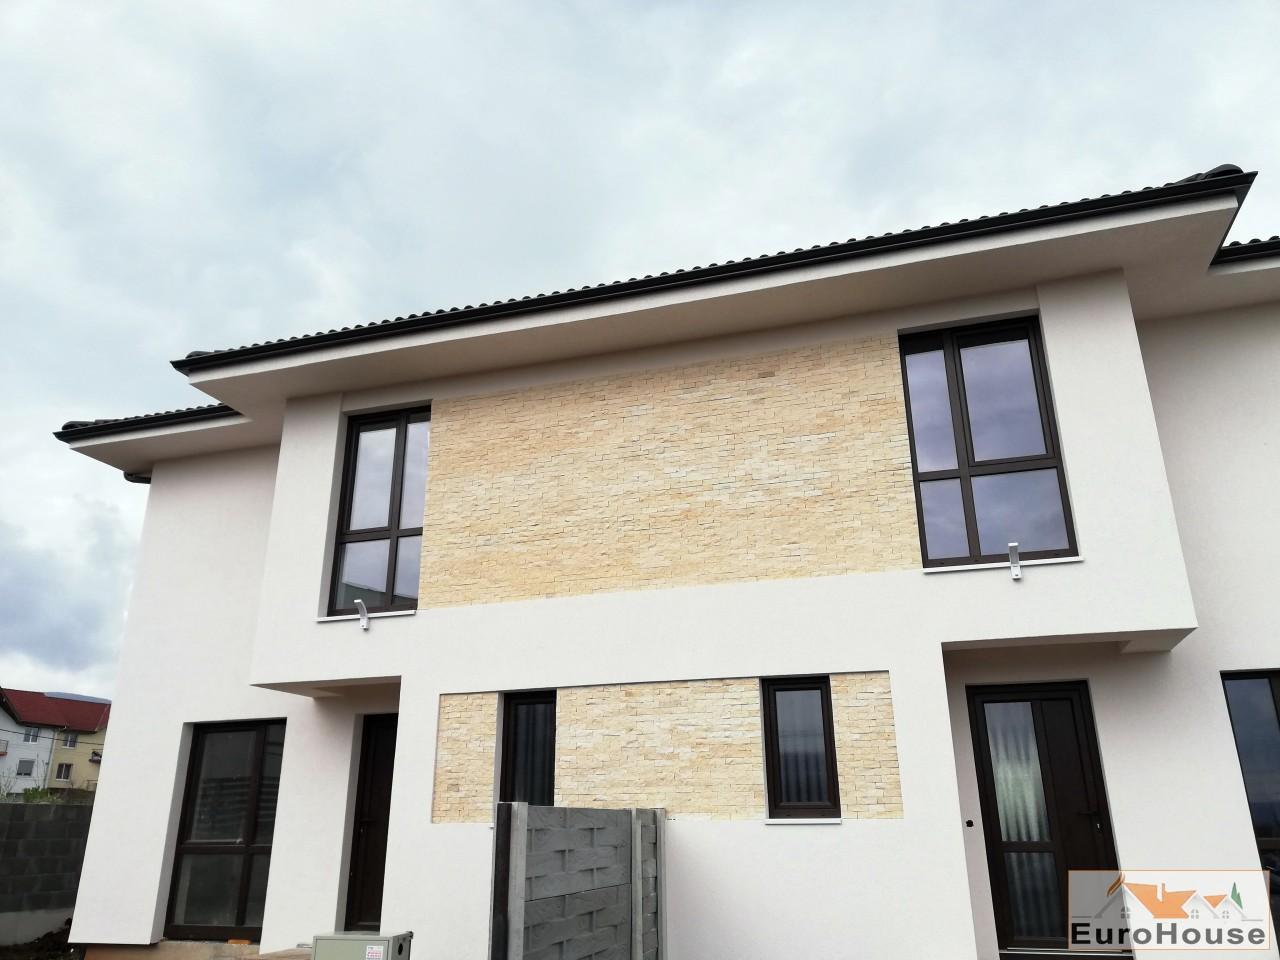 Casa de vanzare in Alba Iulia zona Lidl-33652-